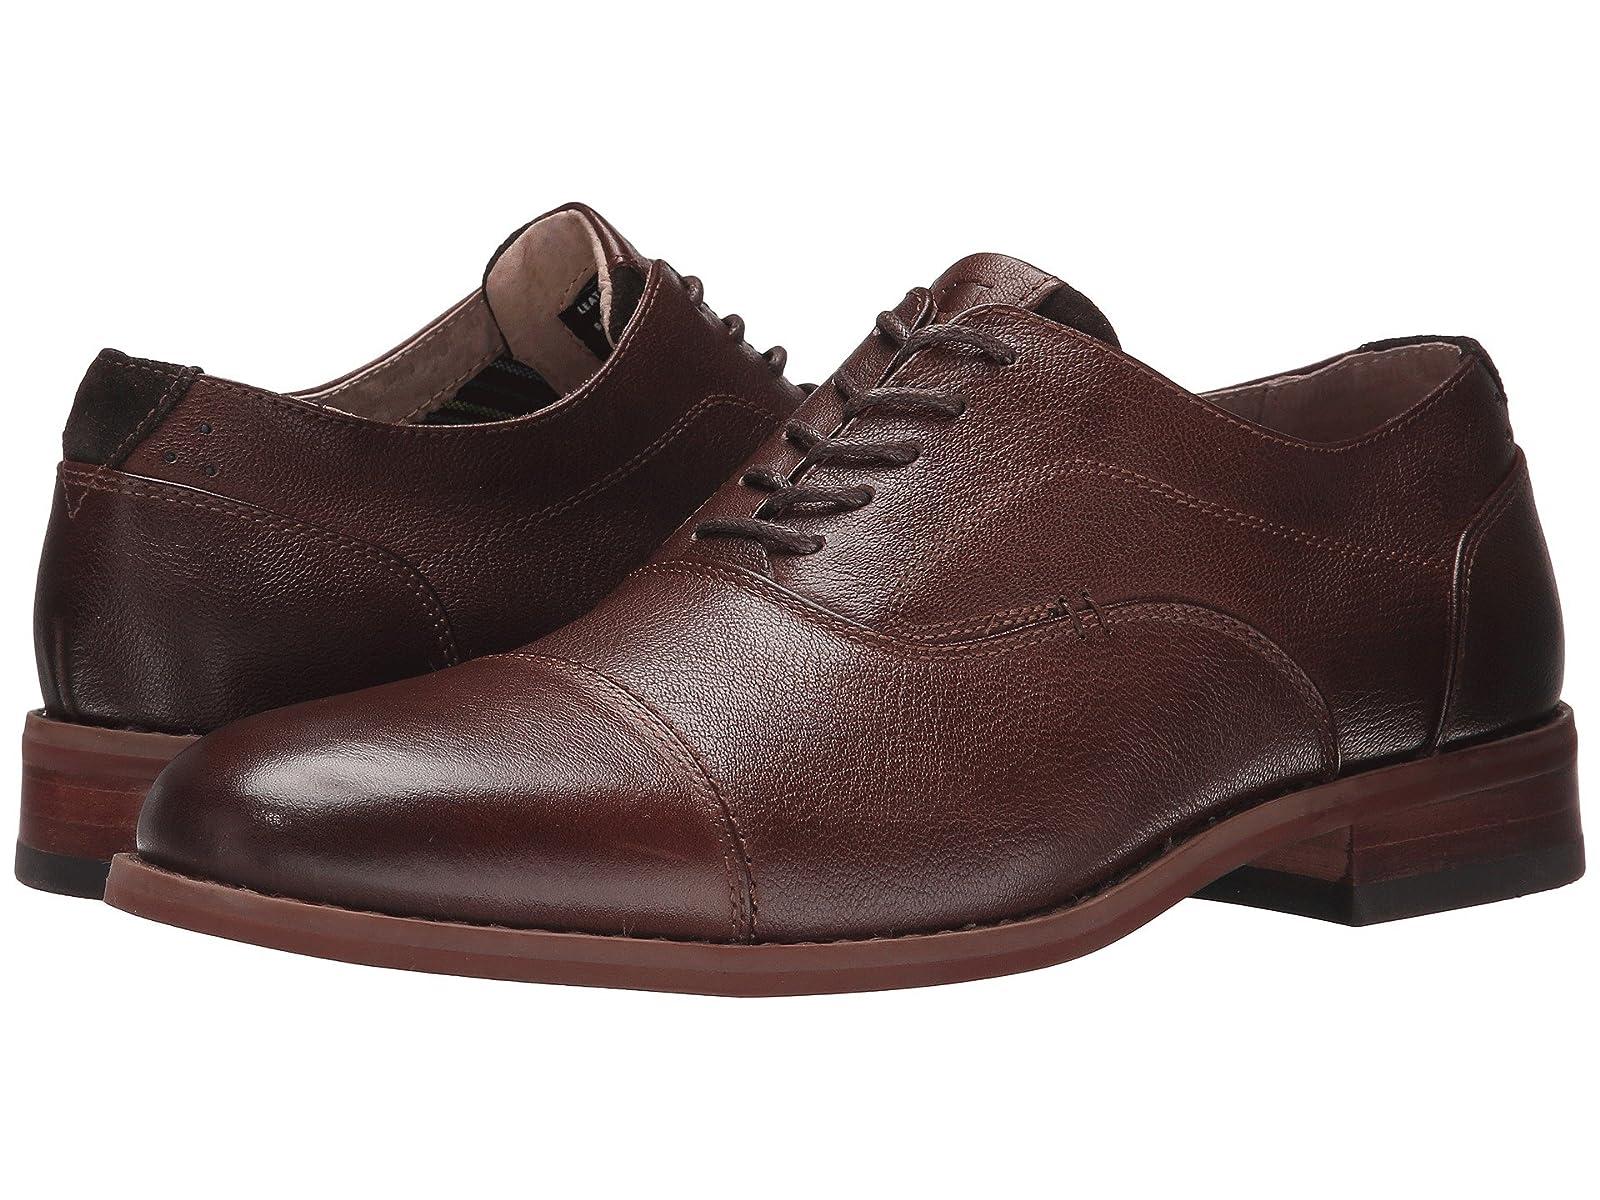 Florsheim Rockit Cap Toe OxfordCheap and distinctive eye-catching shoes